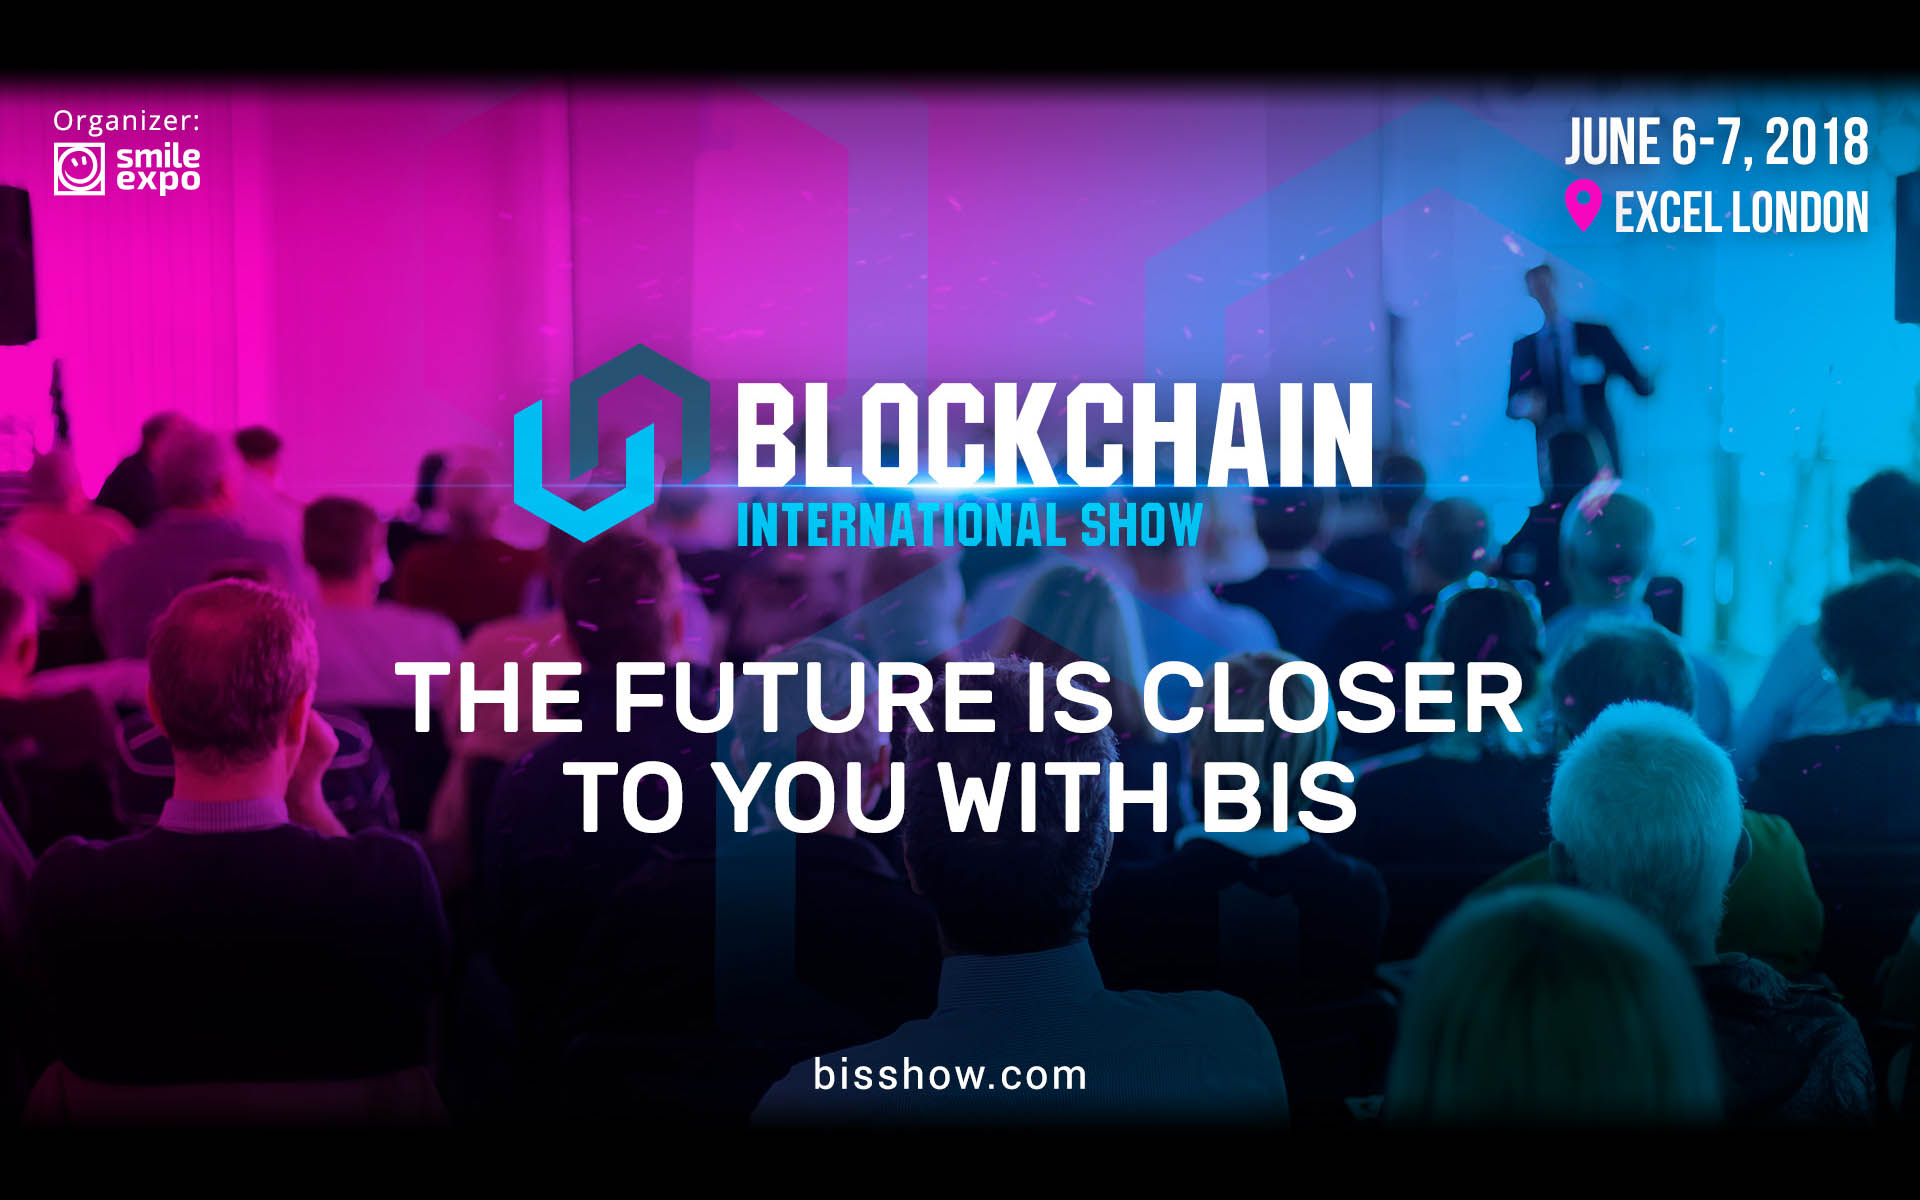 London to Host Major Cryptocurrency Event: Blockchain International Show London